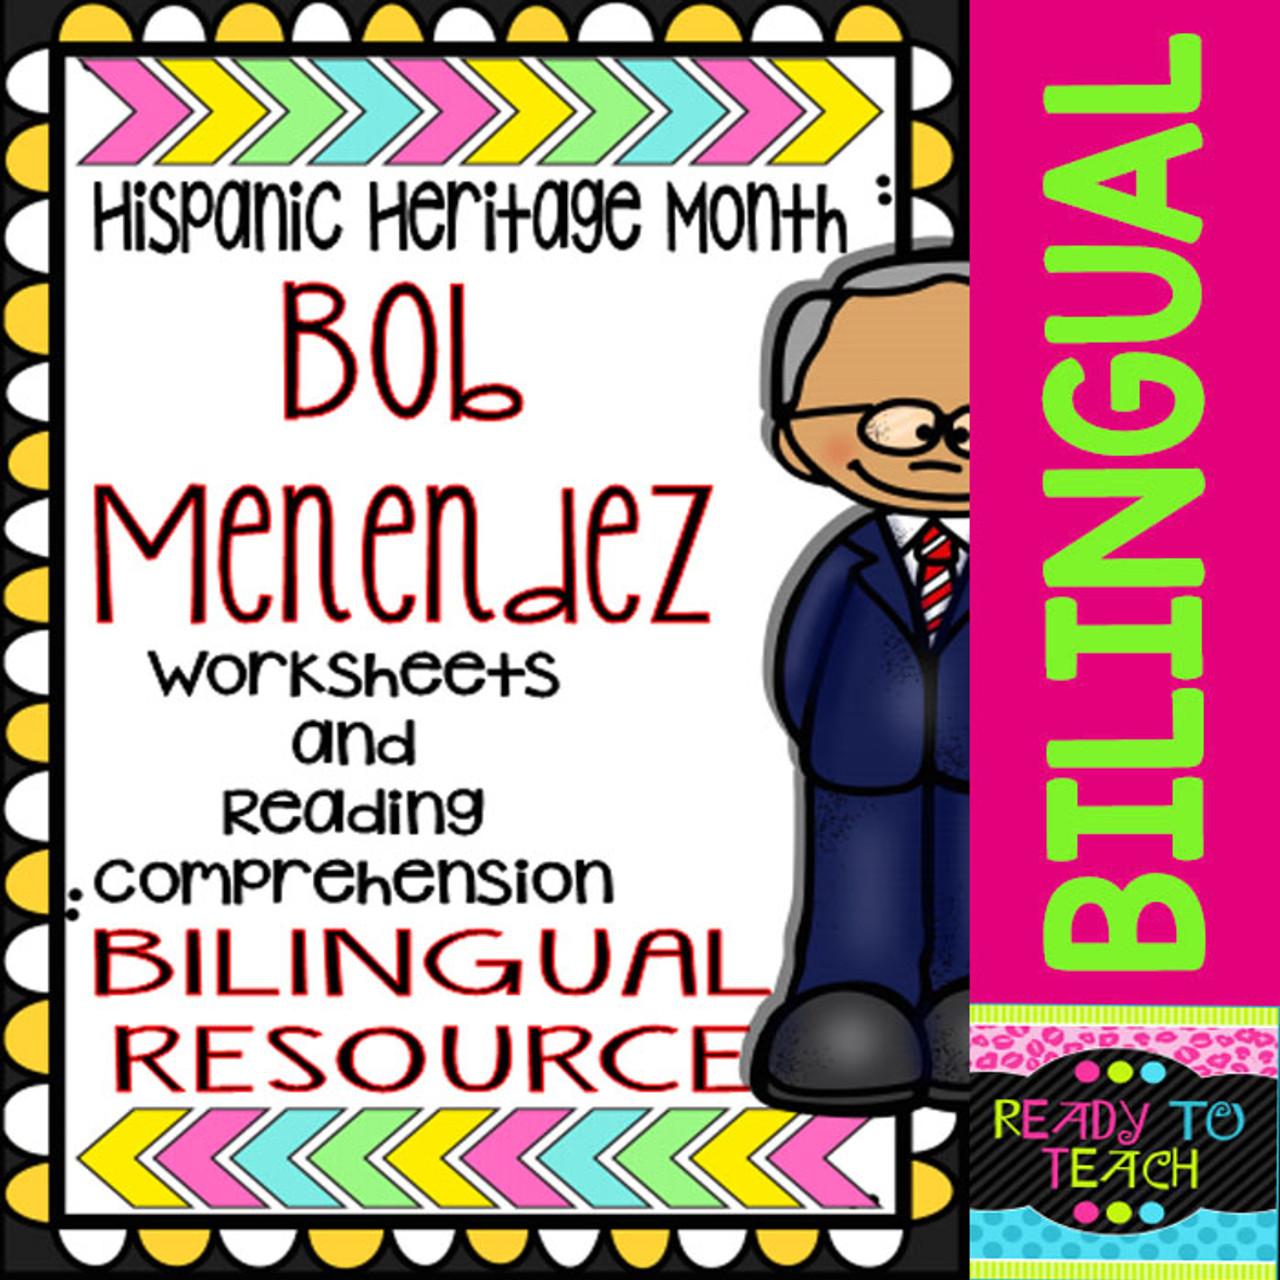 Hispanic Heritage Month - Bob Menendez - Worksheets and Readings (Bilingual)  - Amped Up Learning [ 1280 x 1280 Pixel ]